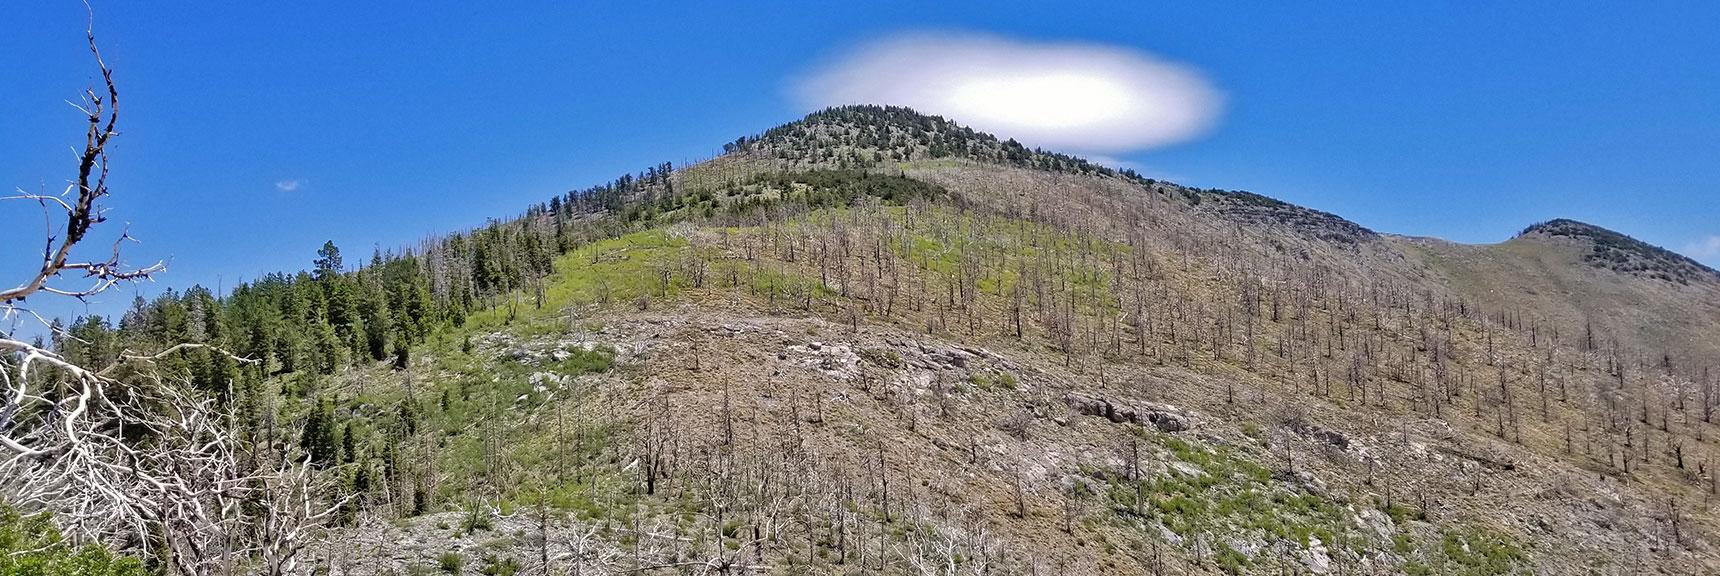 Harris Mountain North Ridge from Griffith Harris Saddle | Harris Mountain Griffith Peak Circuit in Mt. Charleston Wilderness, Nevada